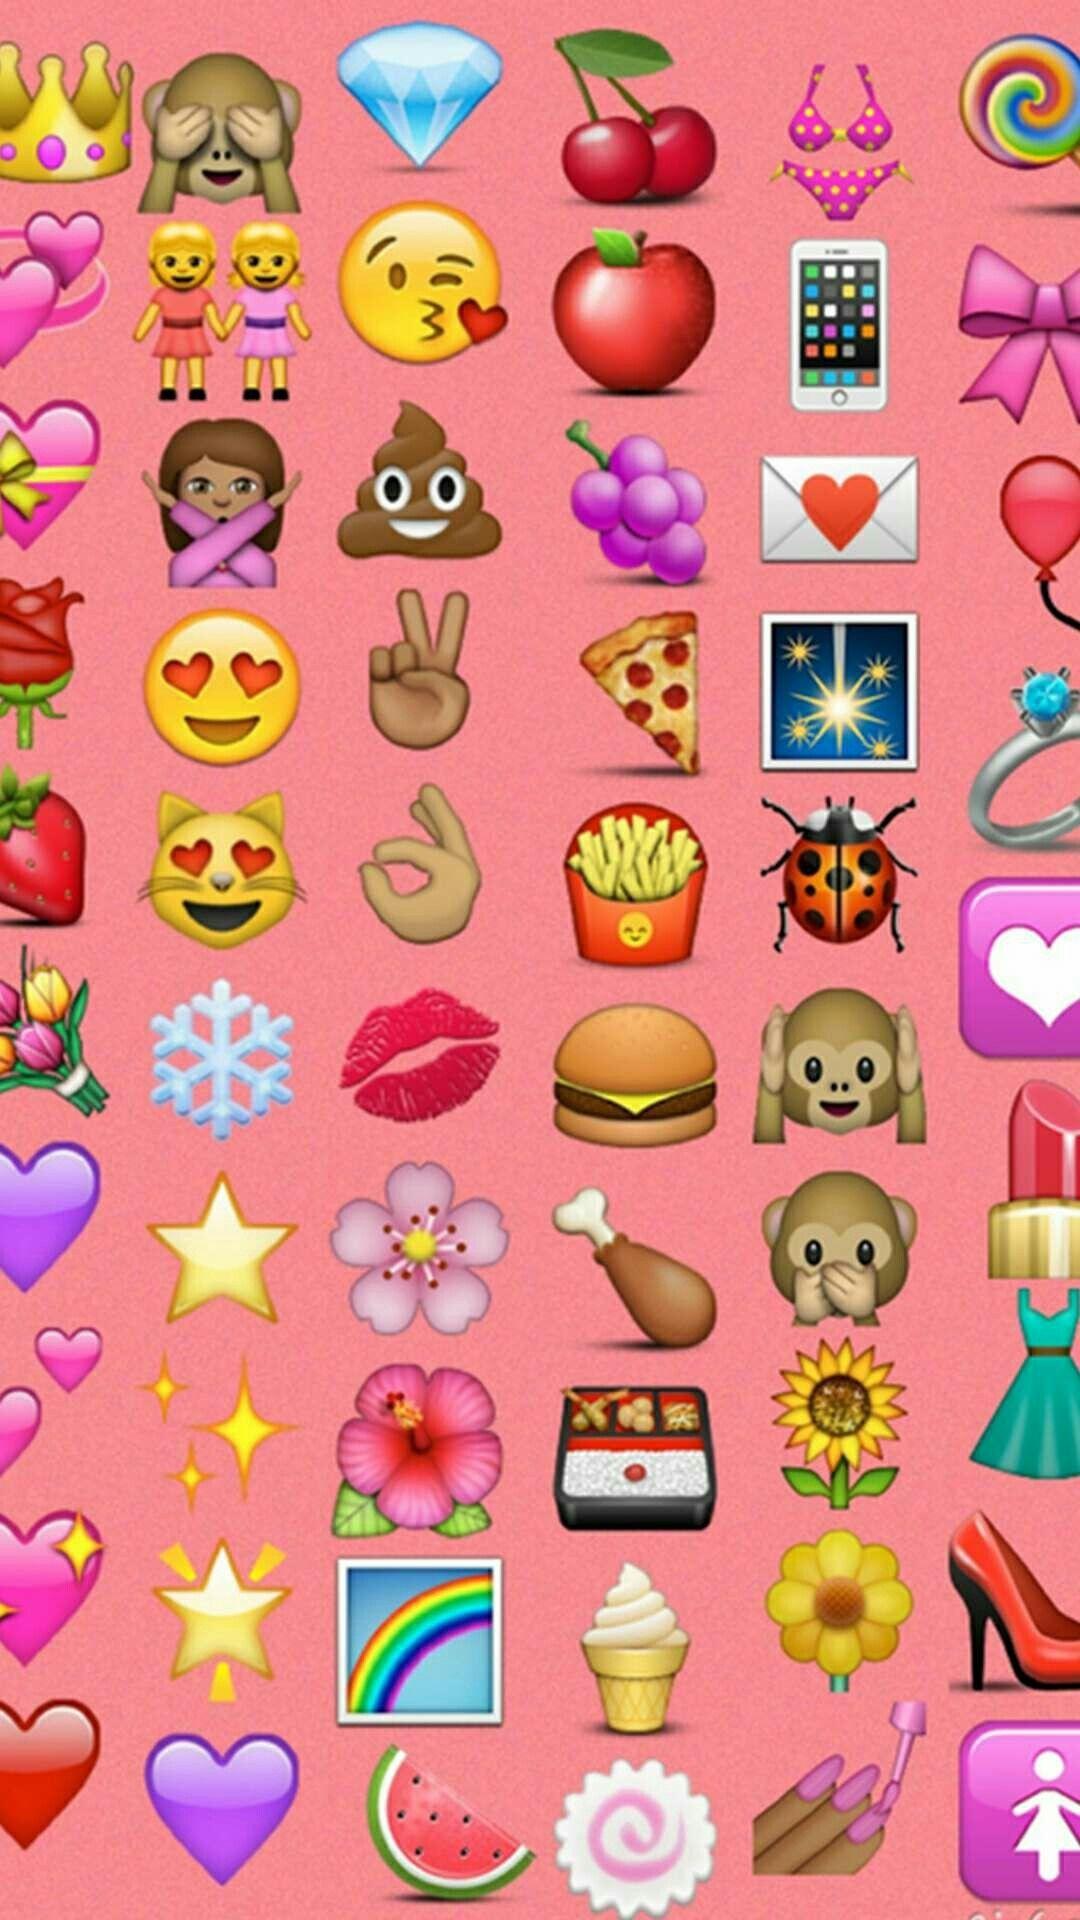 1080x1920 Emoji Wallpaper, Emojis